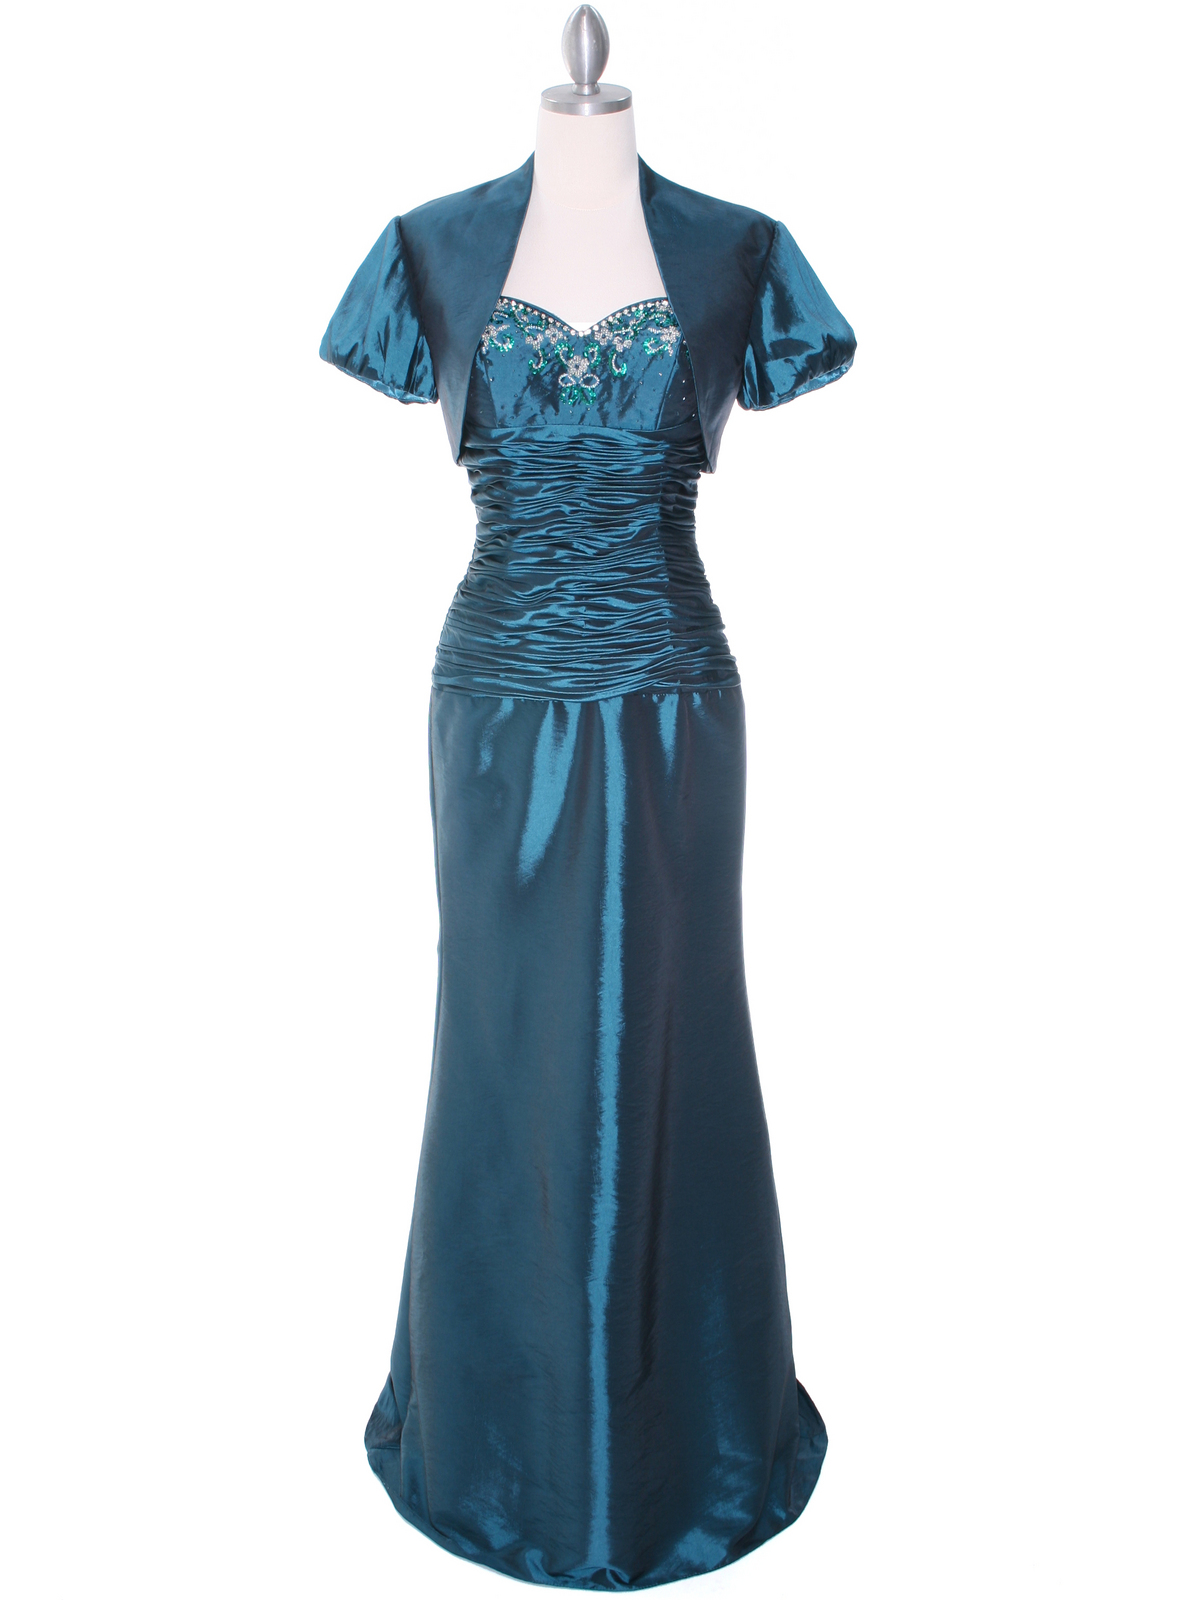 Jade Taffeta Evening Gown with Bolero | Sung Boutique L.A.